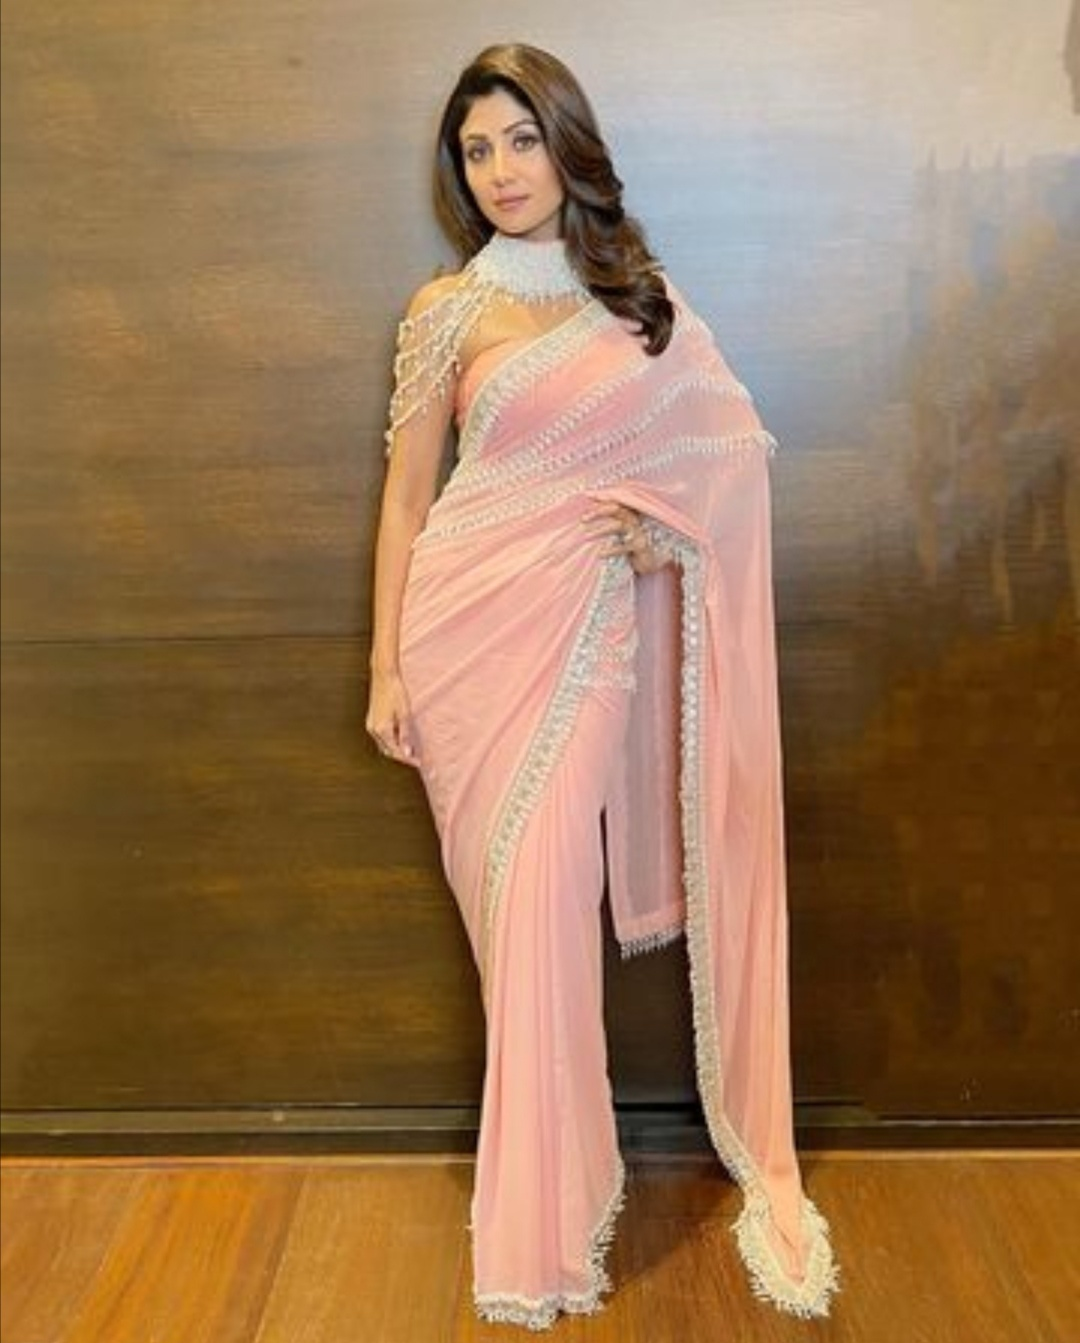 Net Worth Of Shilpa Shetty